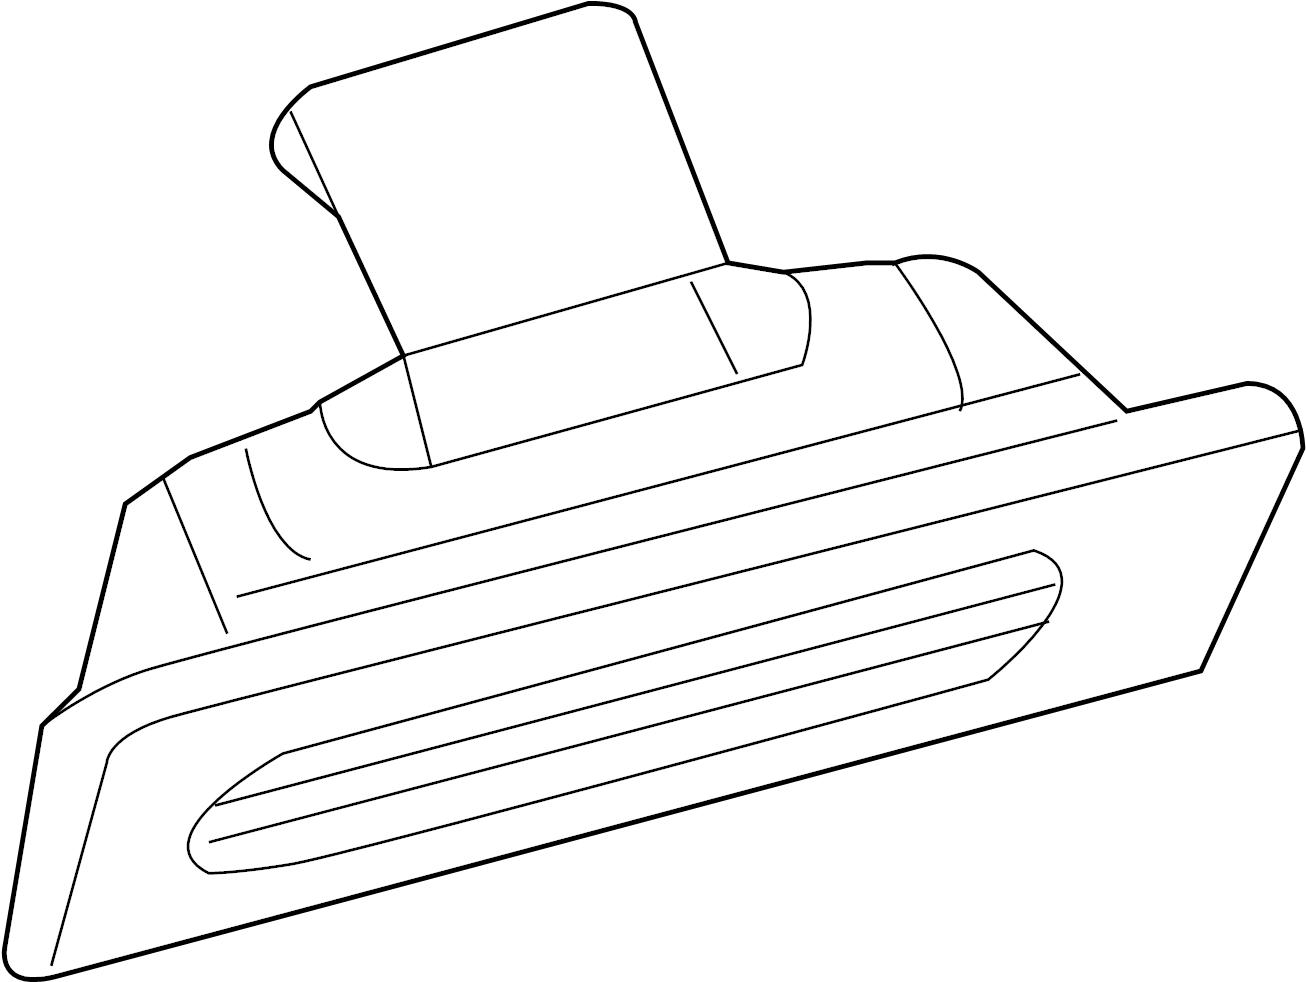 1k8943021d - license plate light assembly